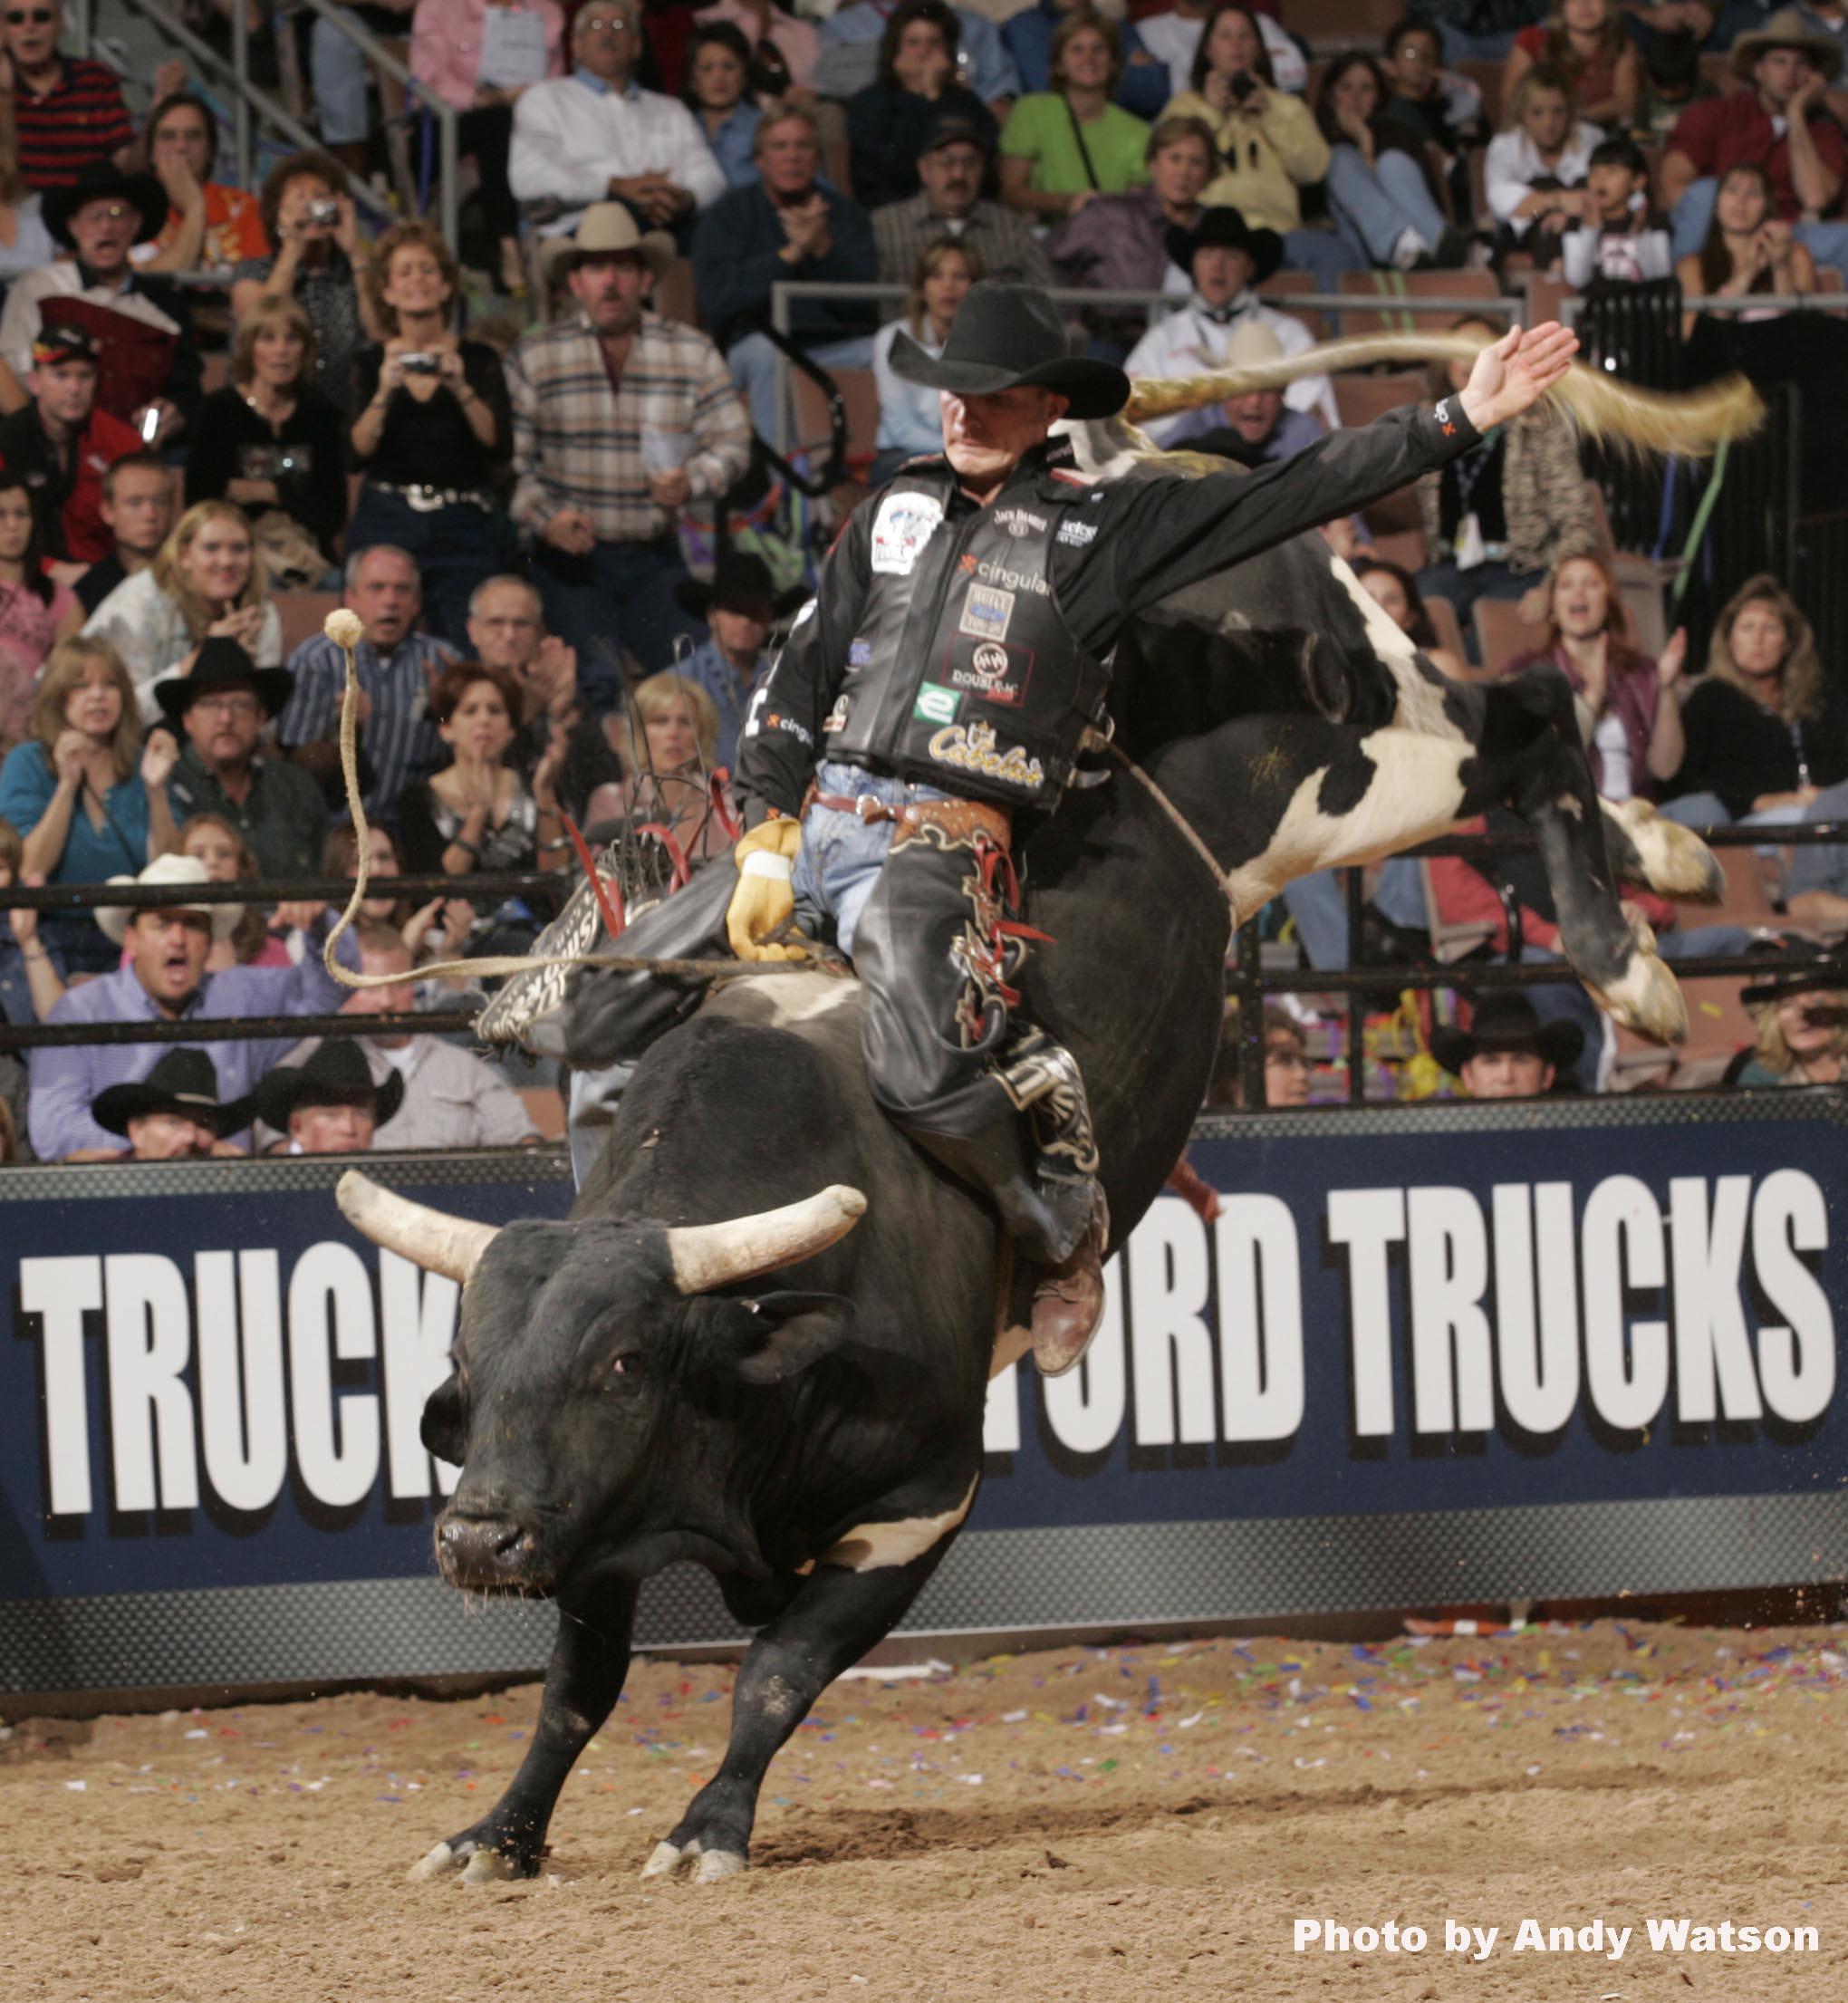 Pbr bull riding wallpaper 69 images - Bull riding wallpapers ...